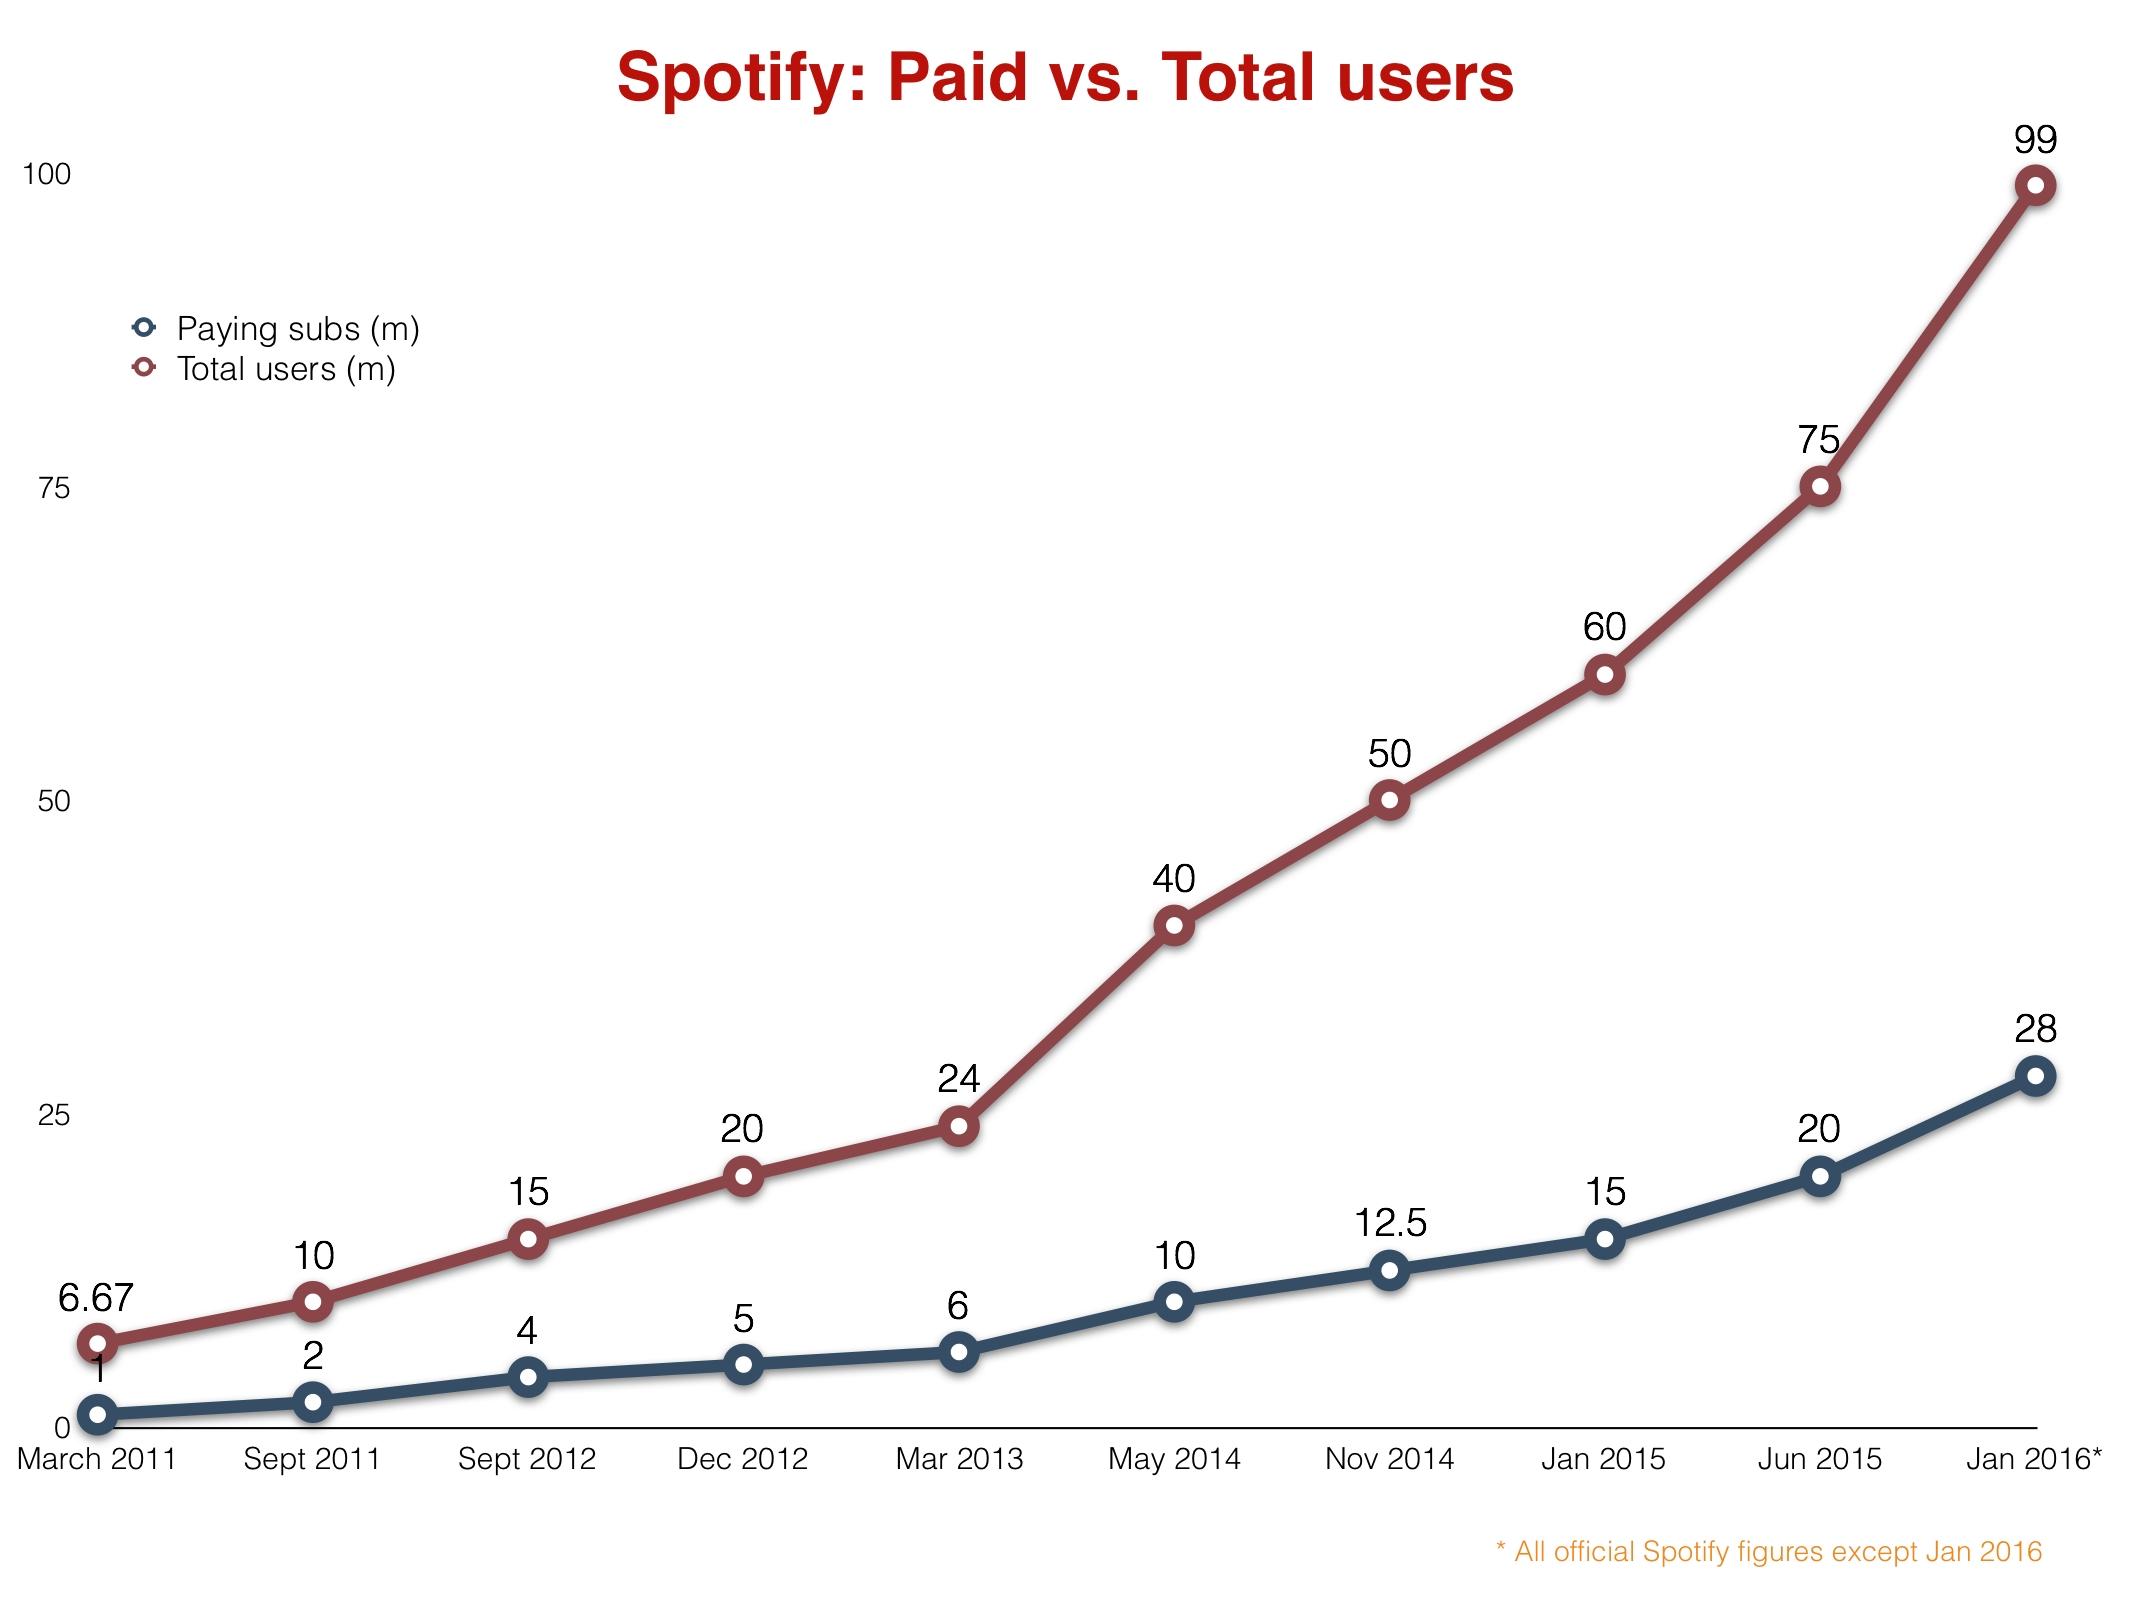 Spotifypaidvstotal